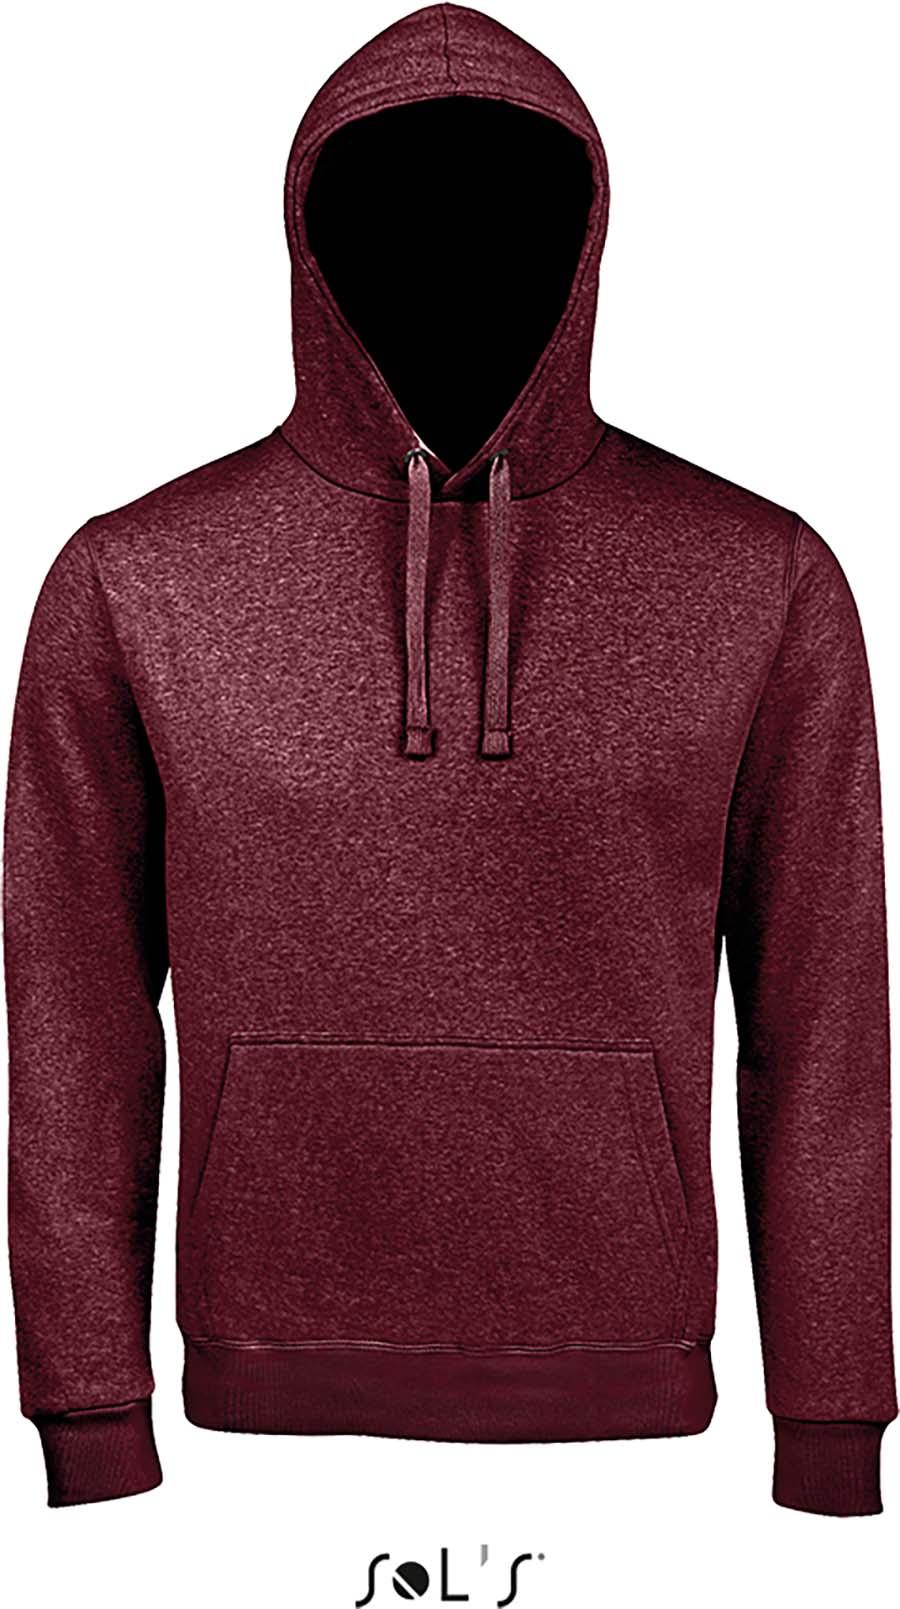 Sweat-shirt unisexe à capuche - 1-1403-3